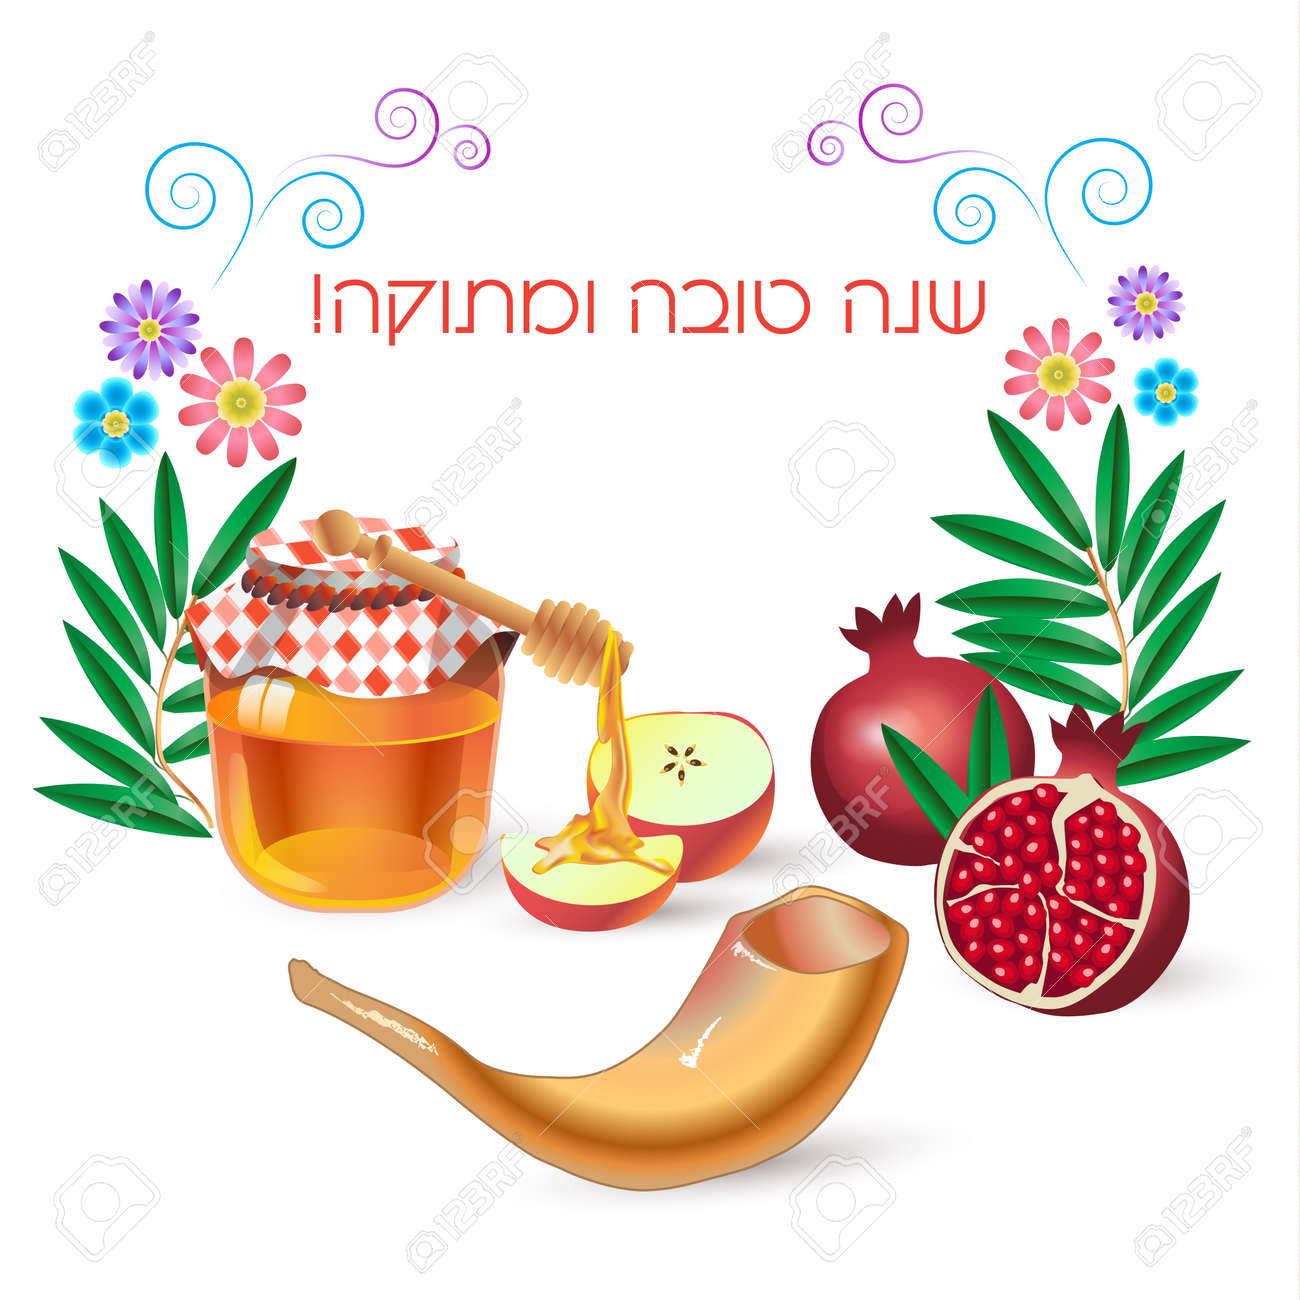 Rosh hashanah card jewish new year greeting text shana tova rosh hashanah card jewish new year greeting text shana tova on hebrew have m4hsunfo